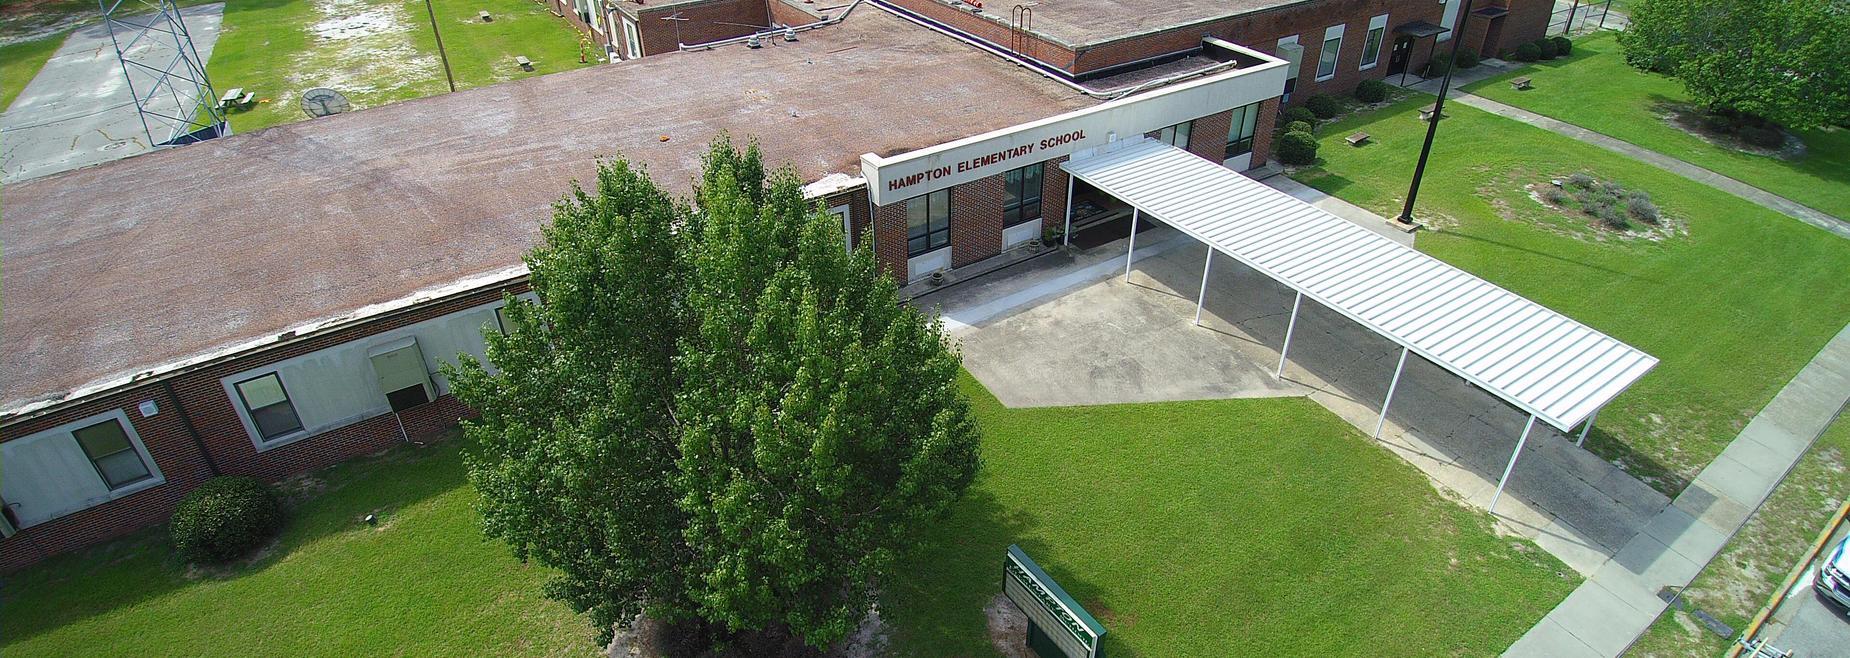 Aerial Hampton Elementary